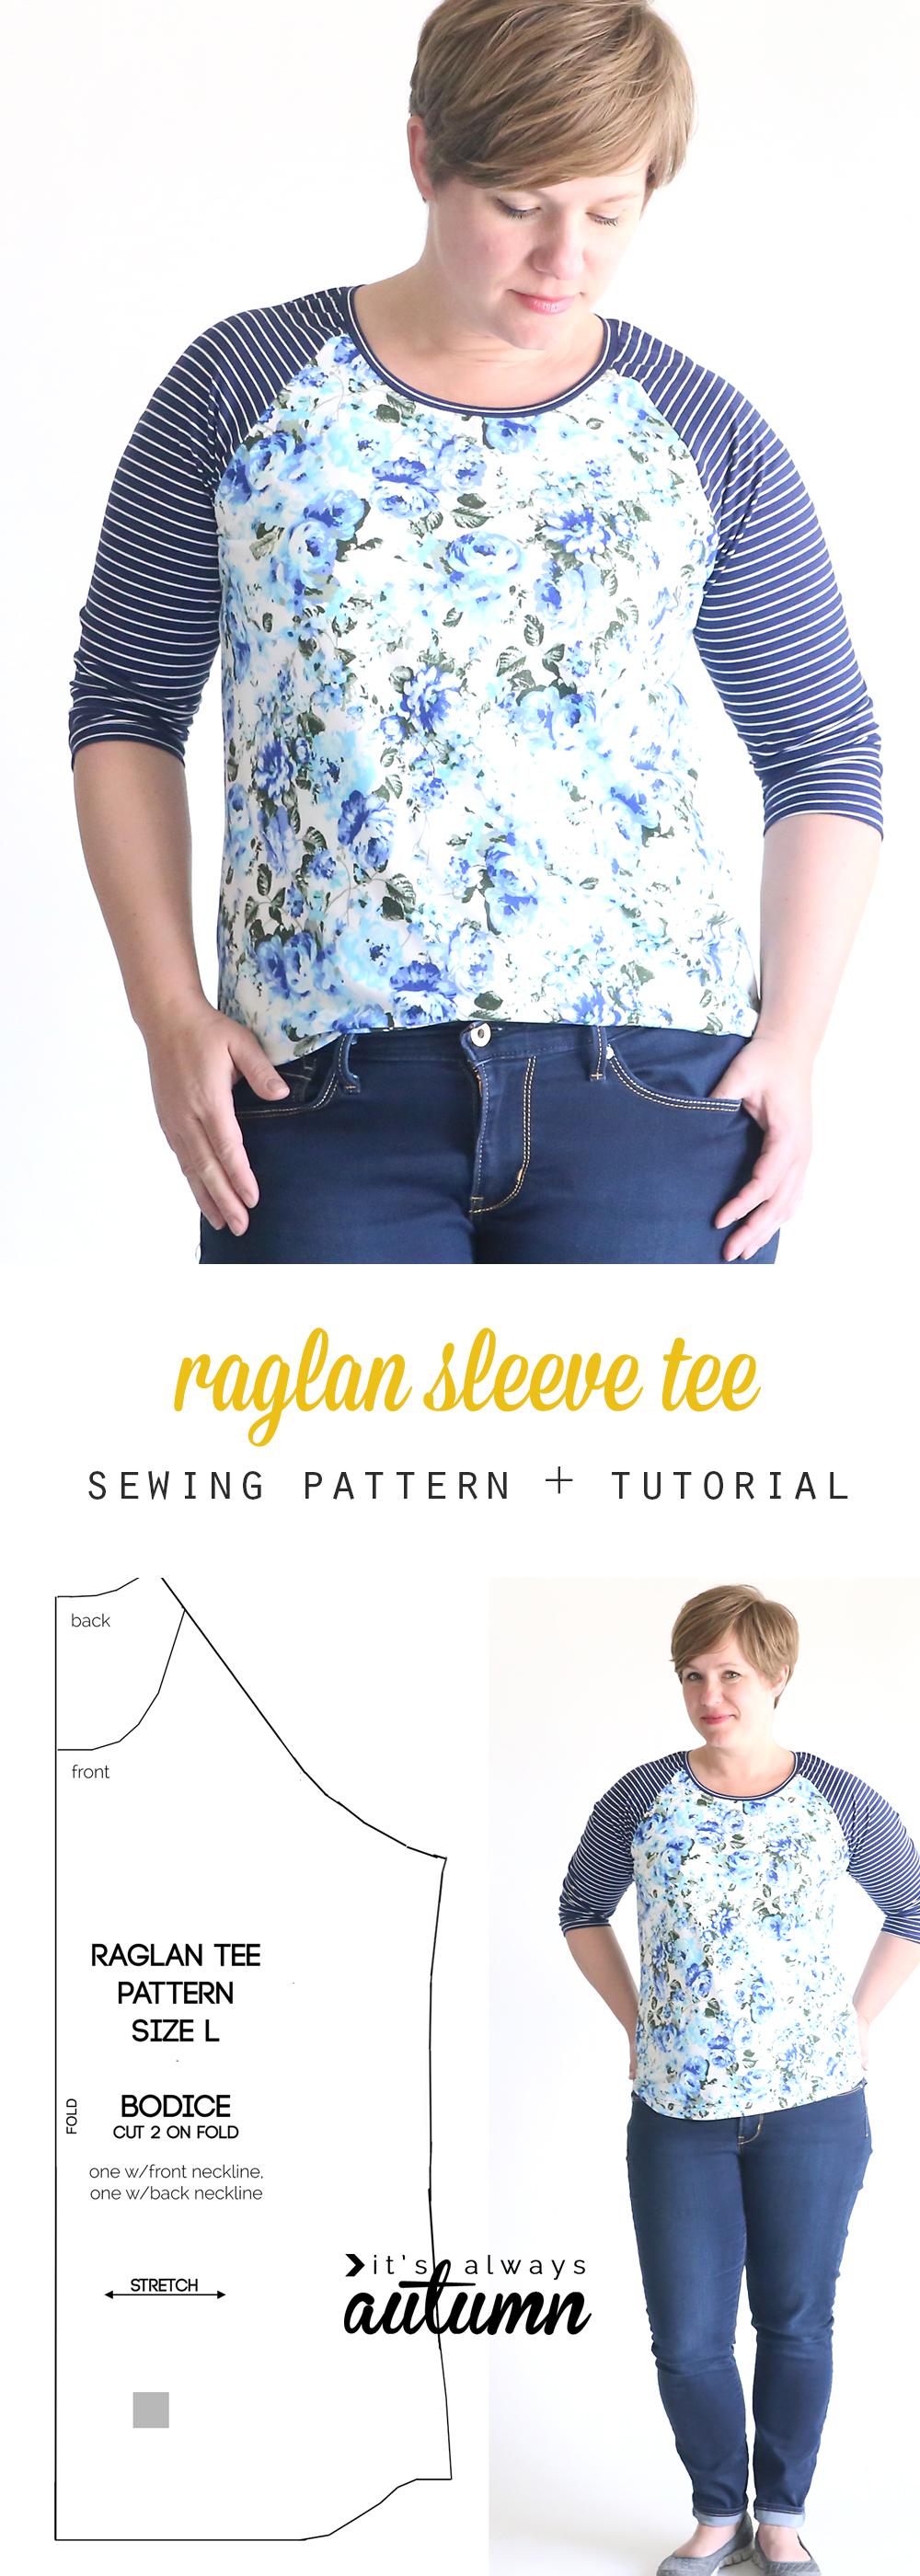 free raglan tee shirt sewing pattern women 39 s size large it 39 s always autumn. Black Bedroom Furniture Sets. Home Design Ideas